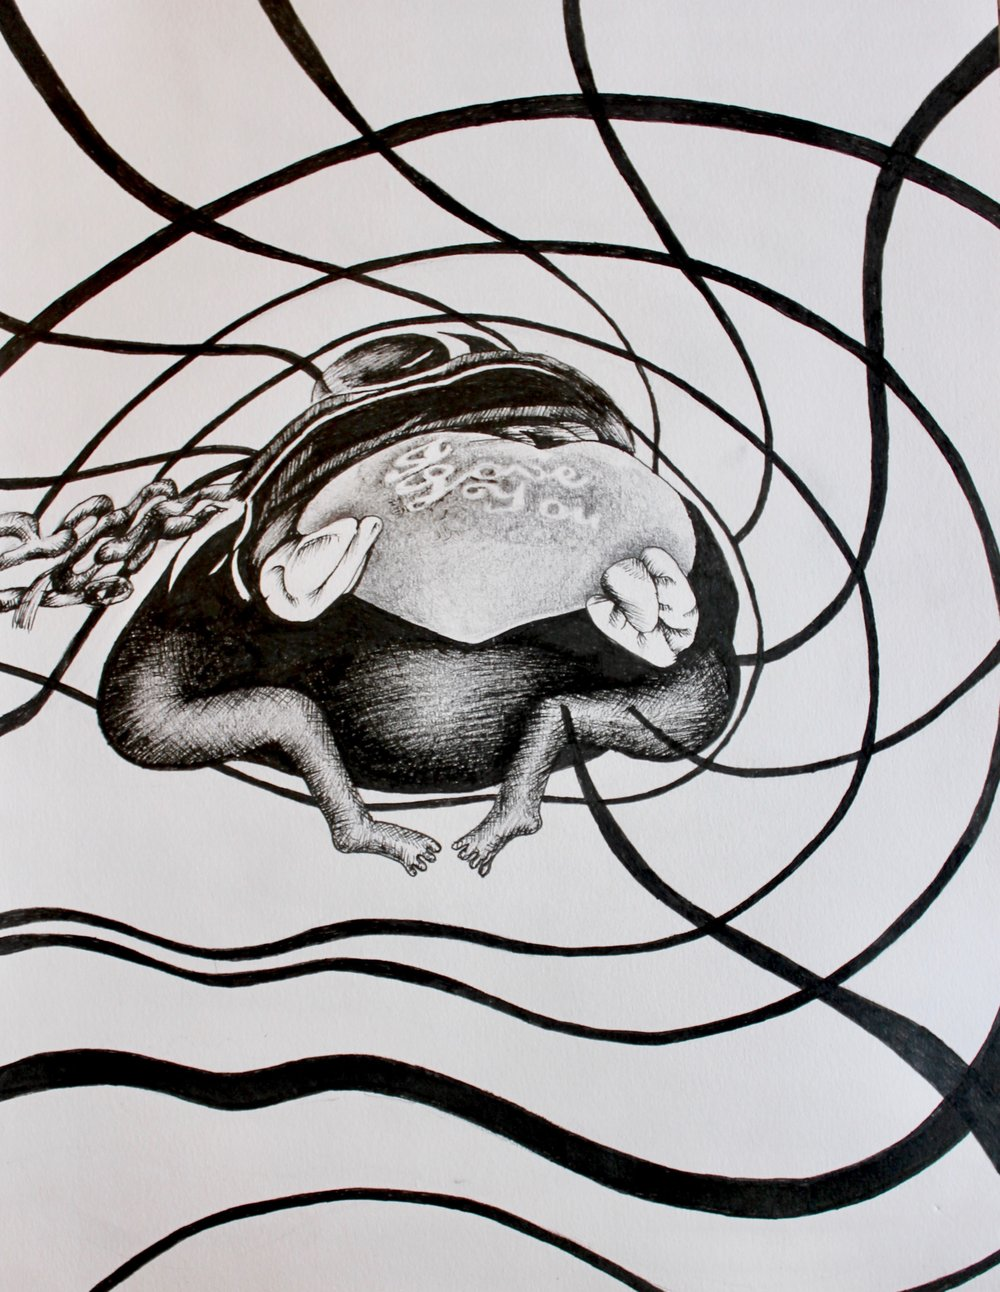 """Romantic, Charming Plush Frog"" 8.5 x 11, Ink"